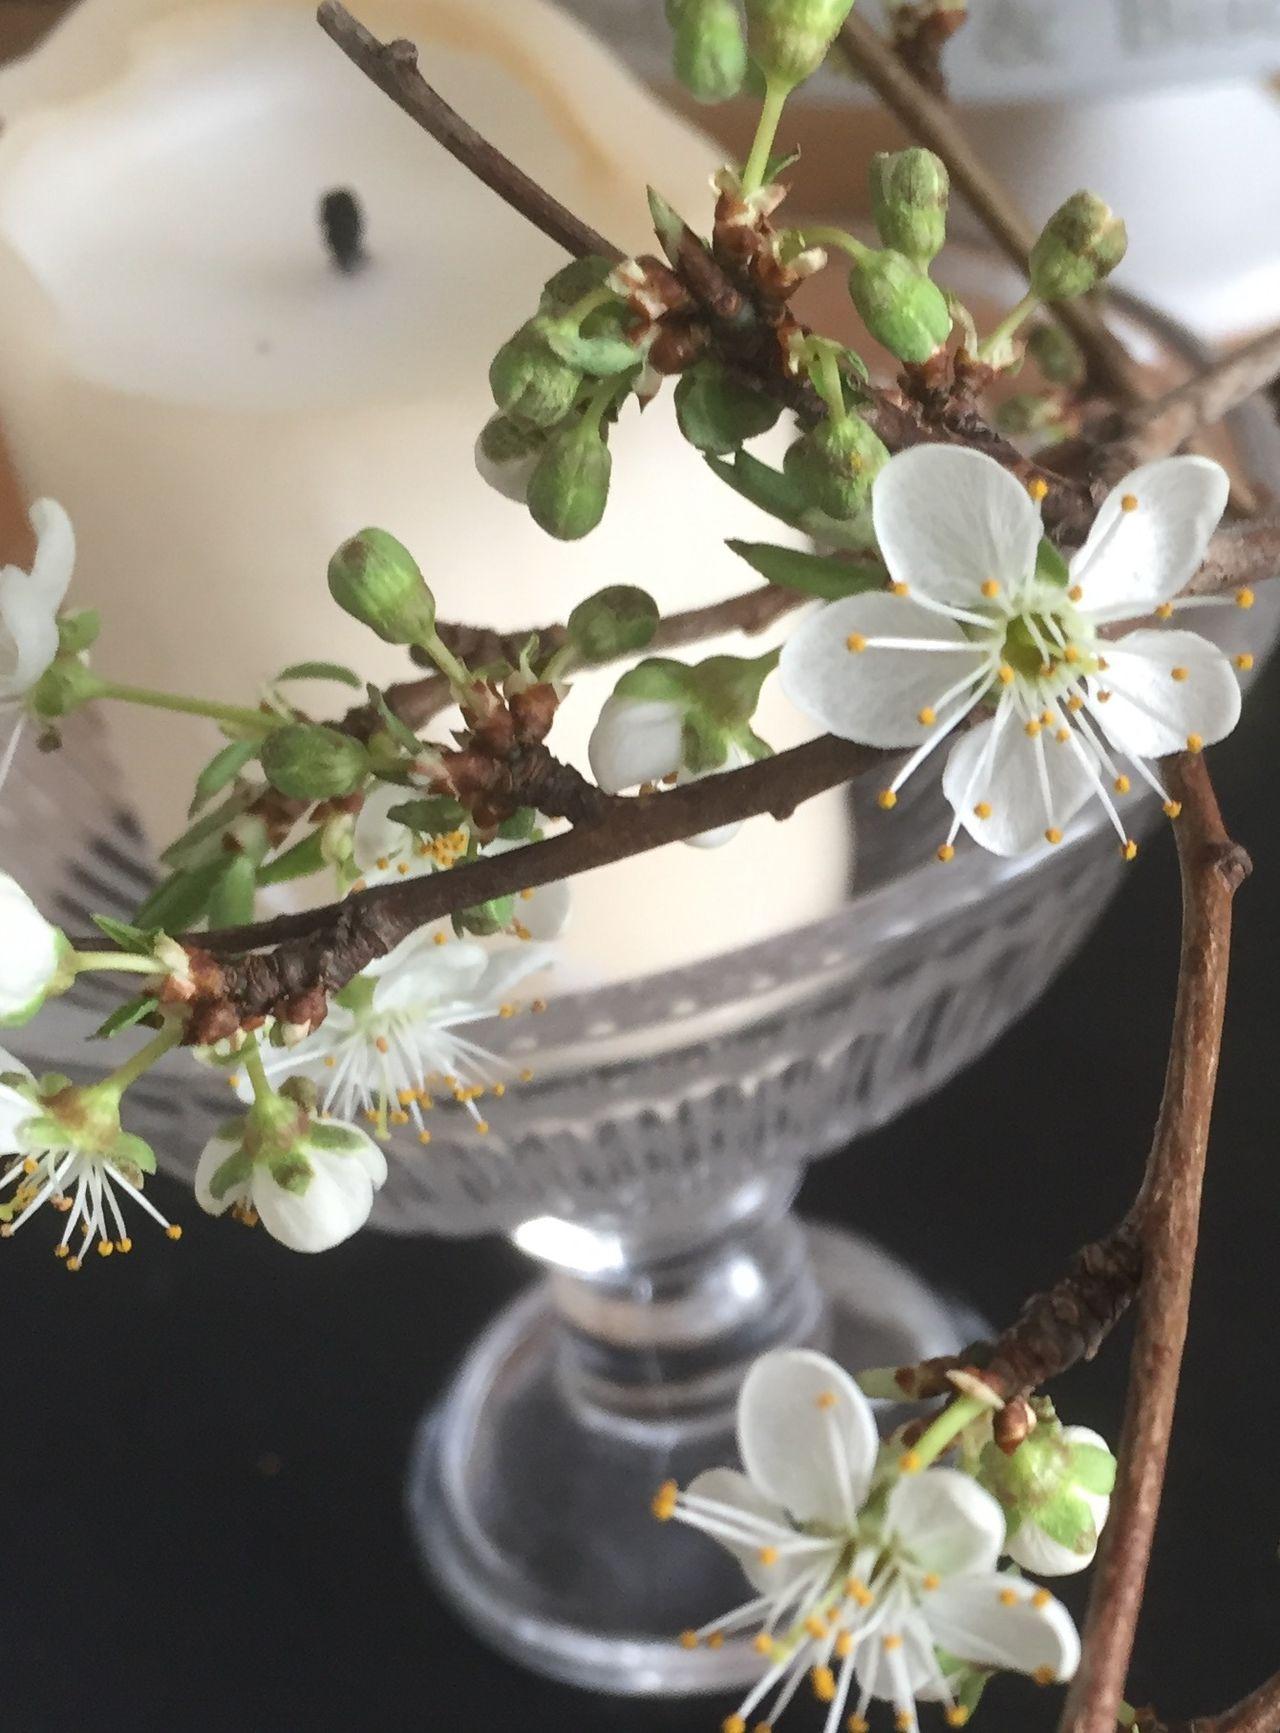 Springtime2016🌾 Spring2016🌾 Frühling2016 Frühling Frühling 2016 🌾 Frühling In Der Vase Blumenpracht🌺🍃 Check This Out Hello World Spring! Springtime Spring Flowers Mirabellenblüte🌾 Spring Plants Flowers Mobileflowers Dekoflowers Dekoflowers Hi!